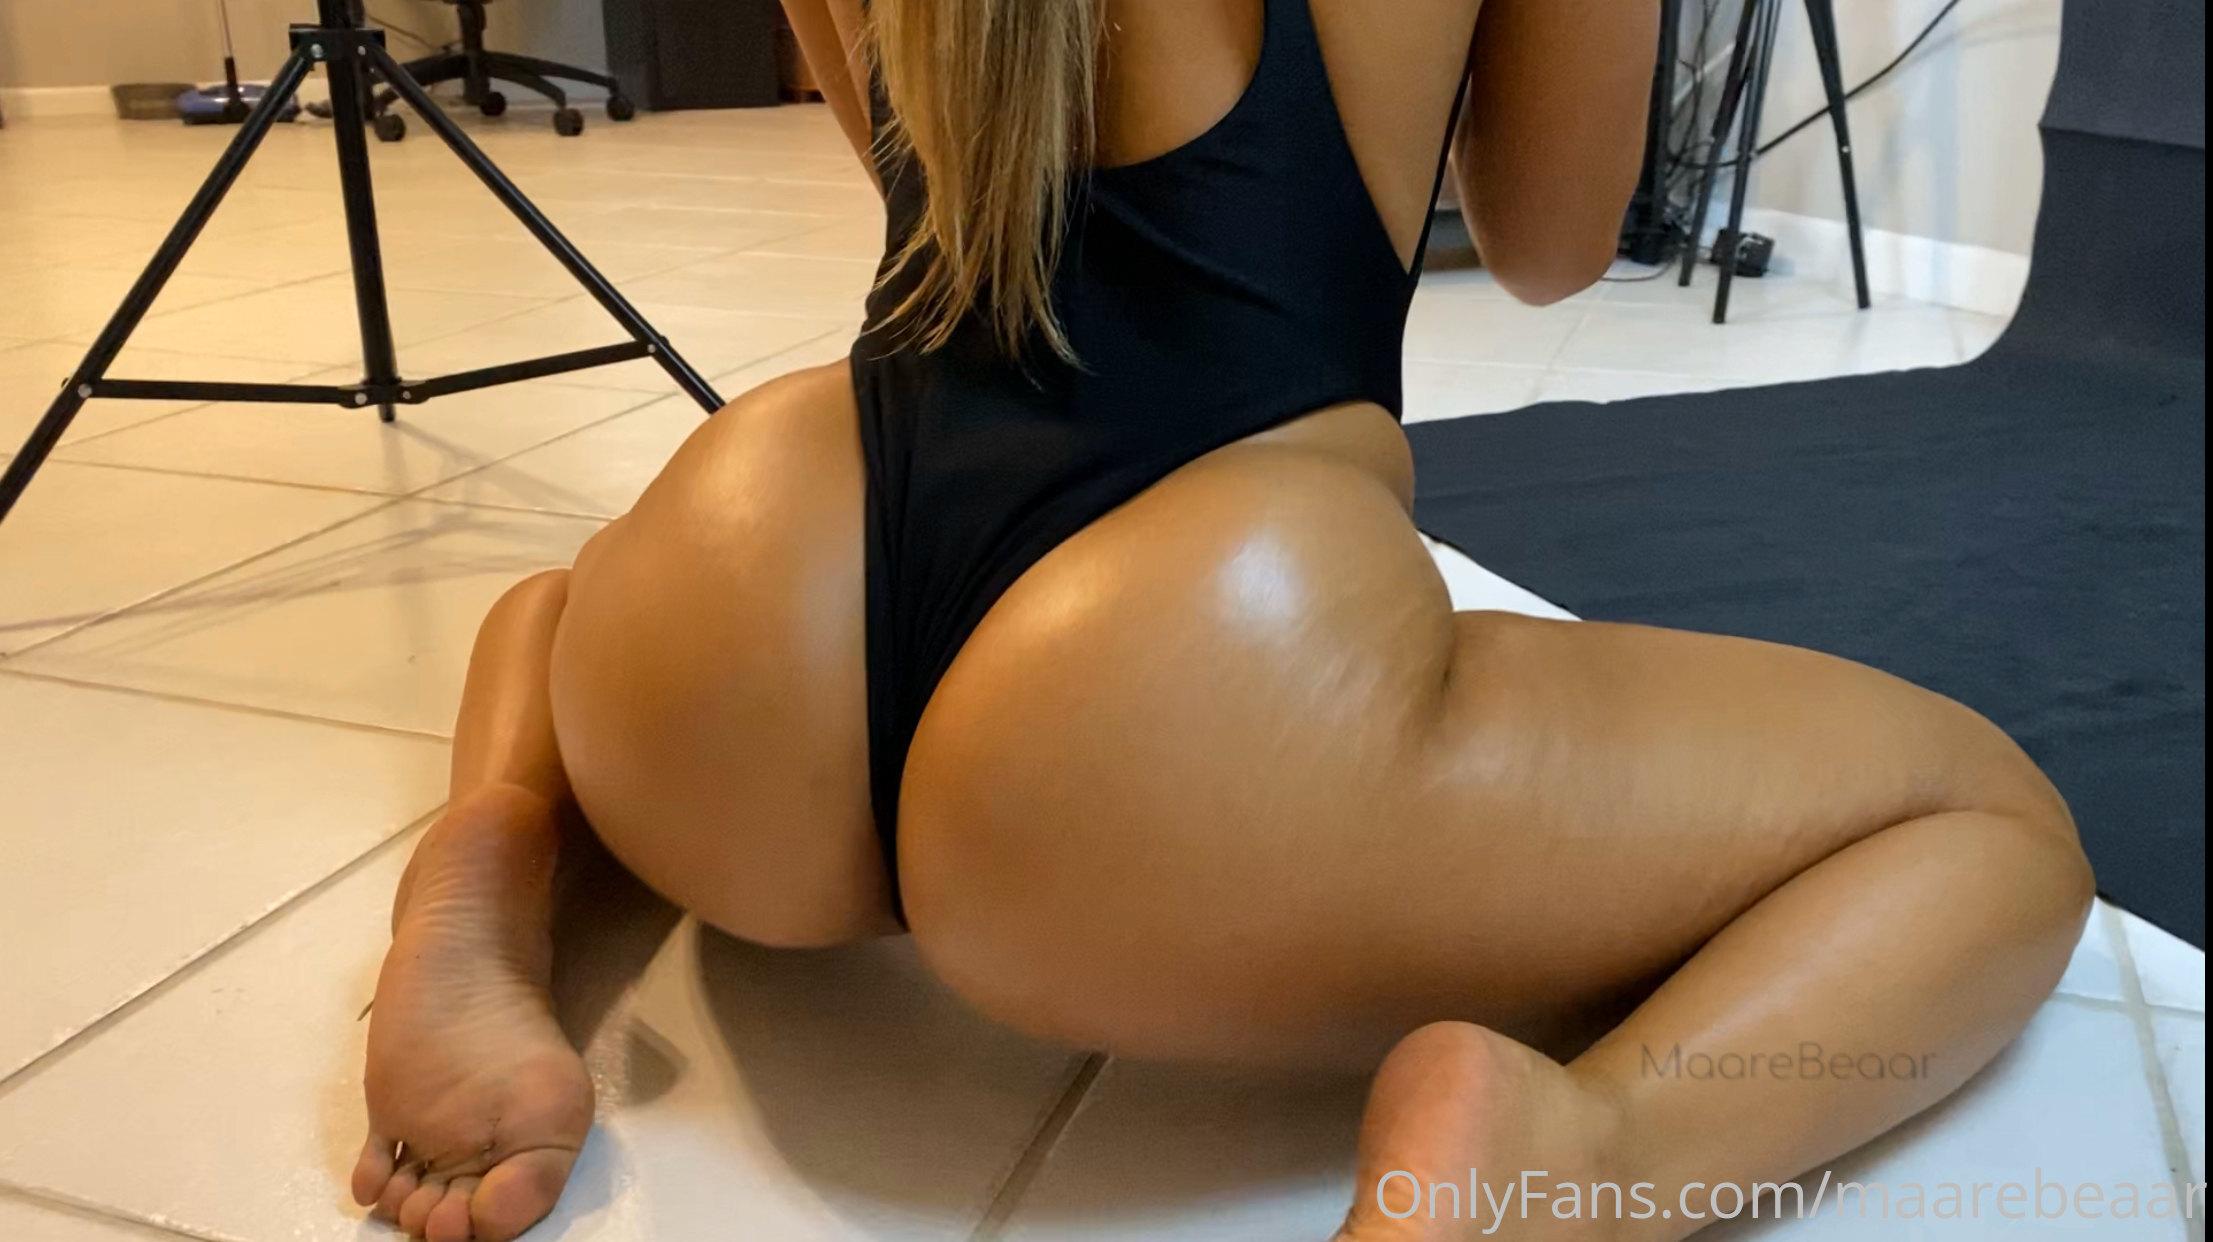 Mariana Morais Onlyfans 0012